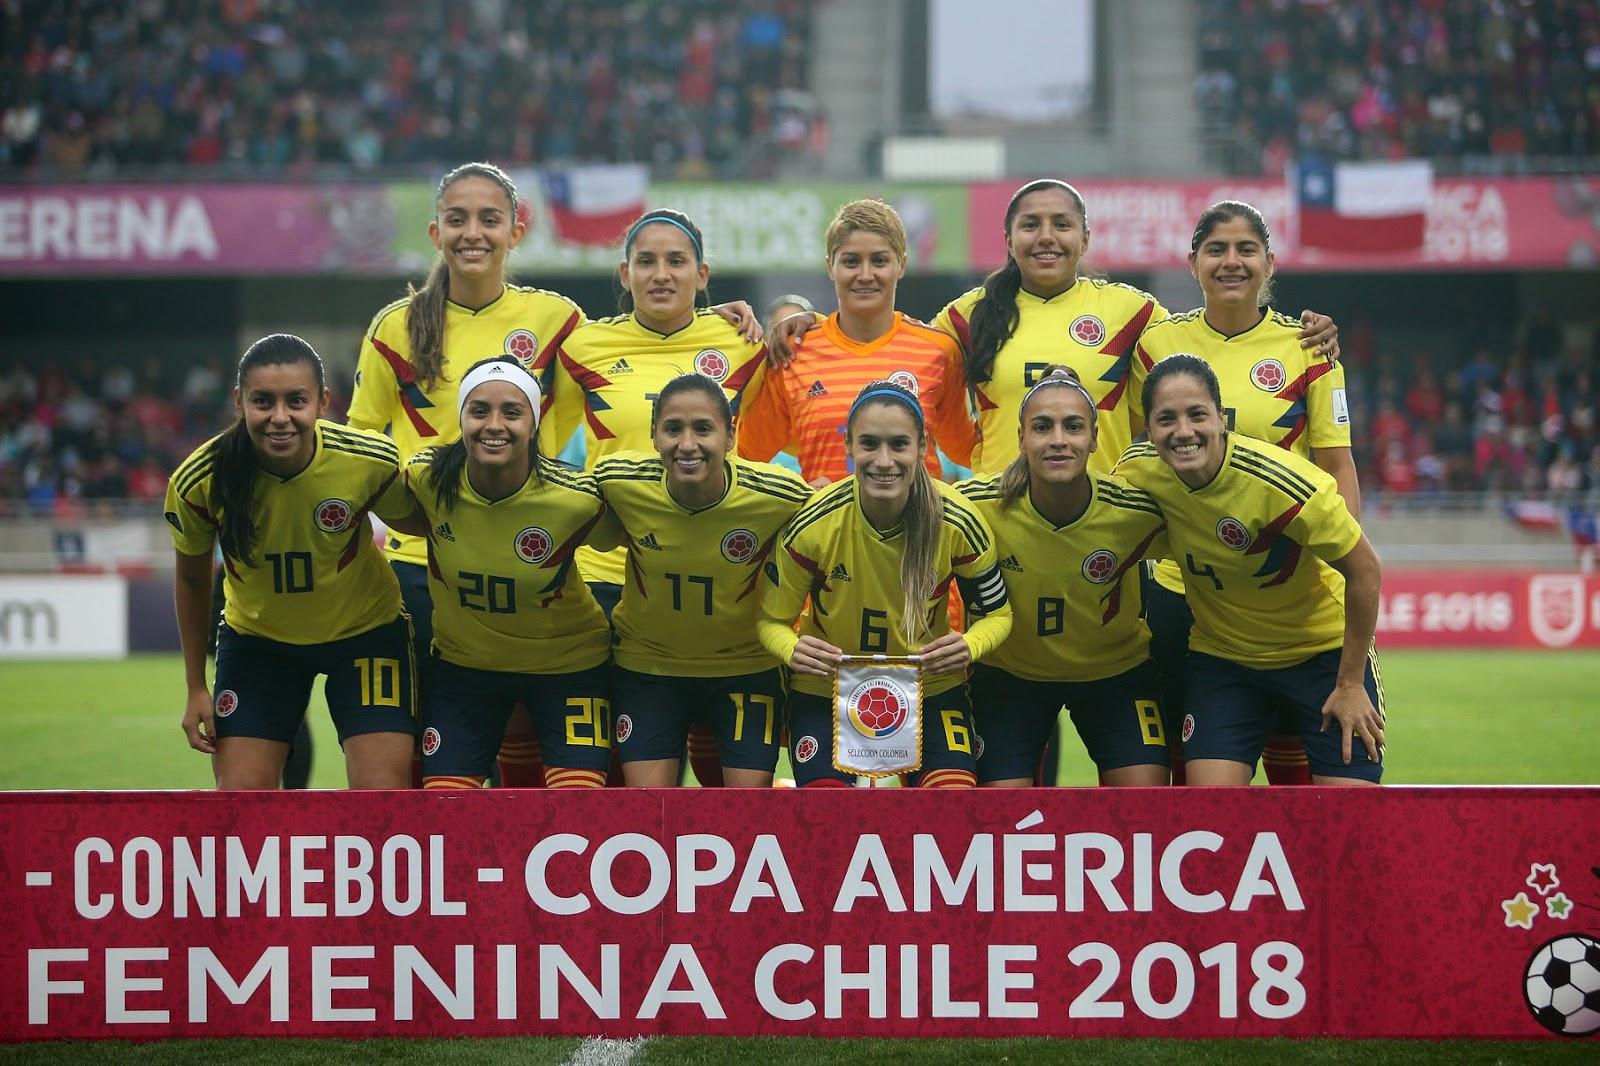 Formación de selección de Colombia ante Chile, Copa América Femenina 2018, 19 de abril